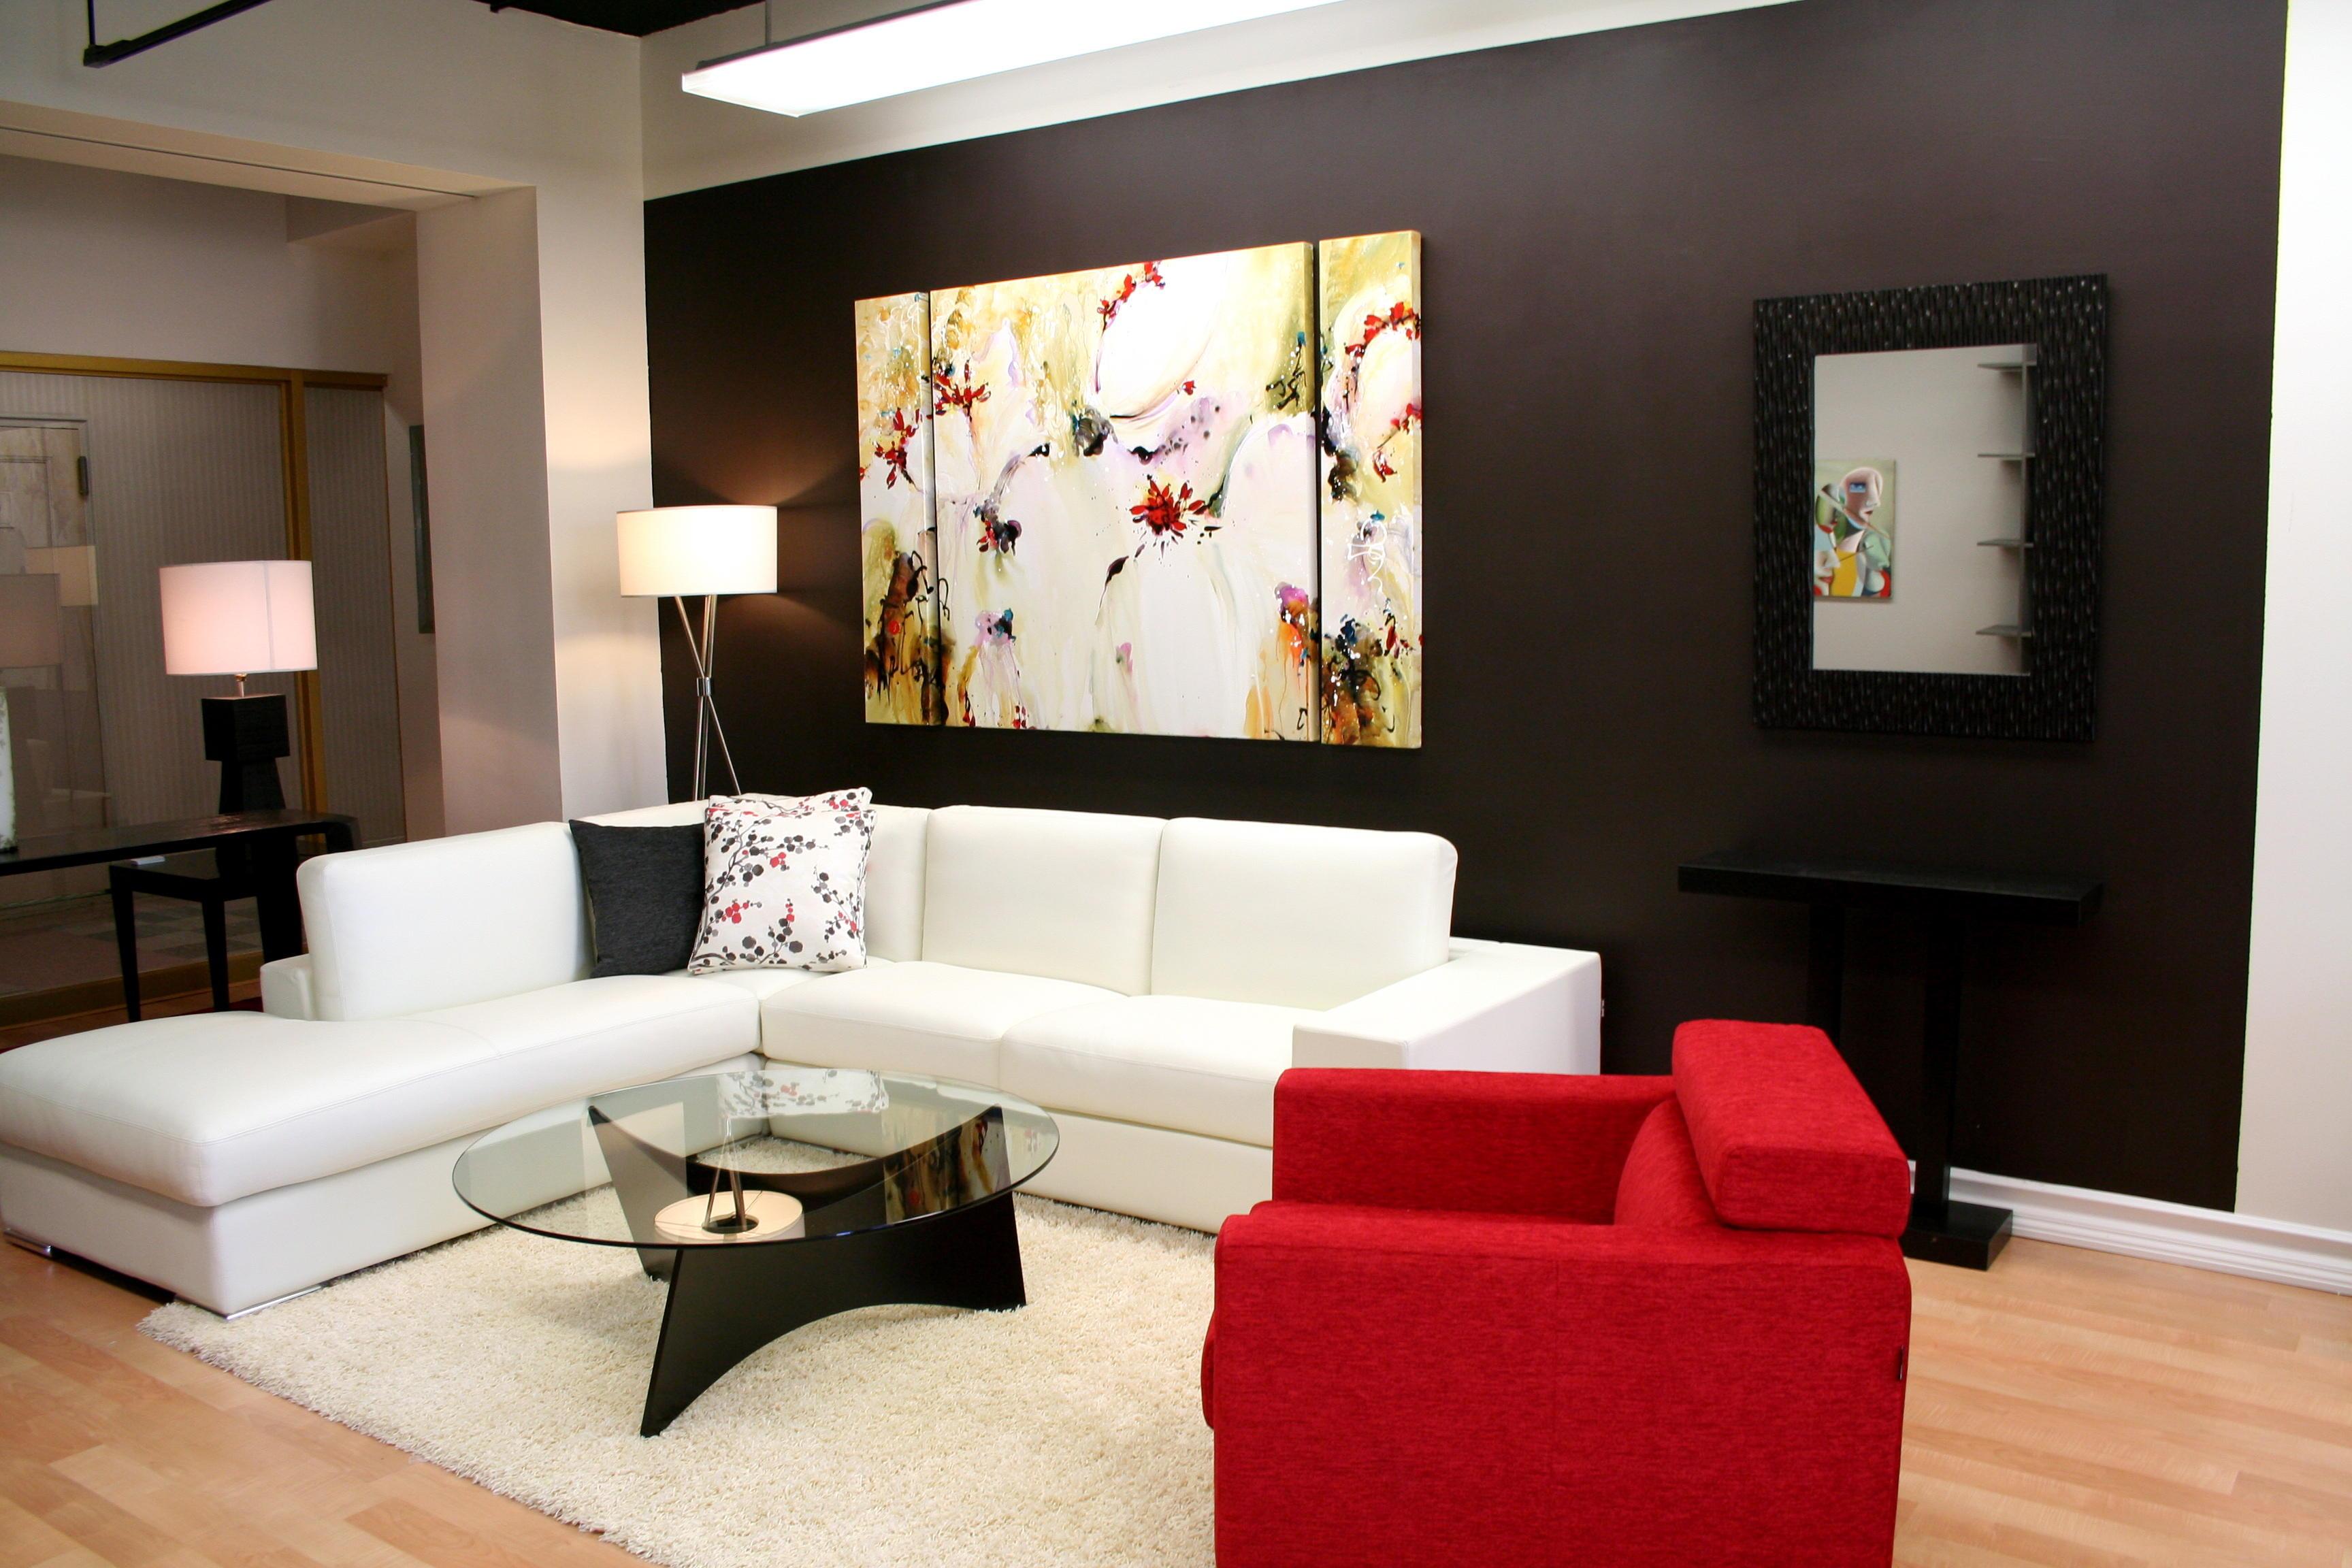 Wall designs for living room living room wall idea ZVFEDIM